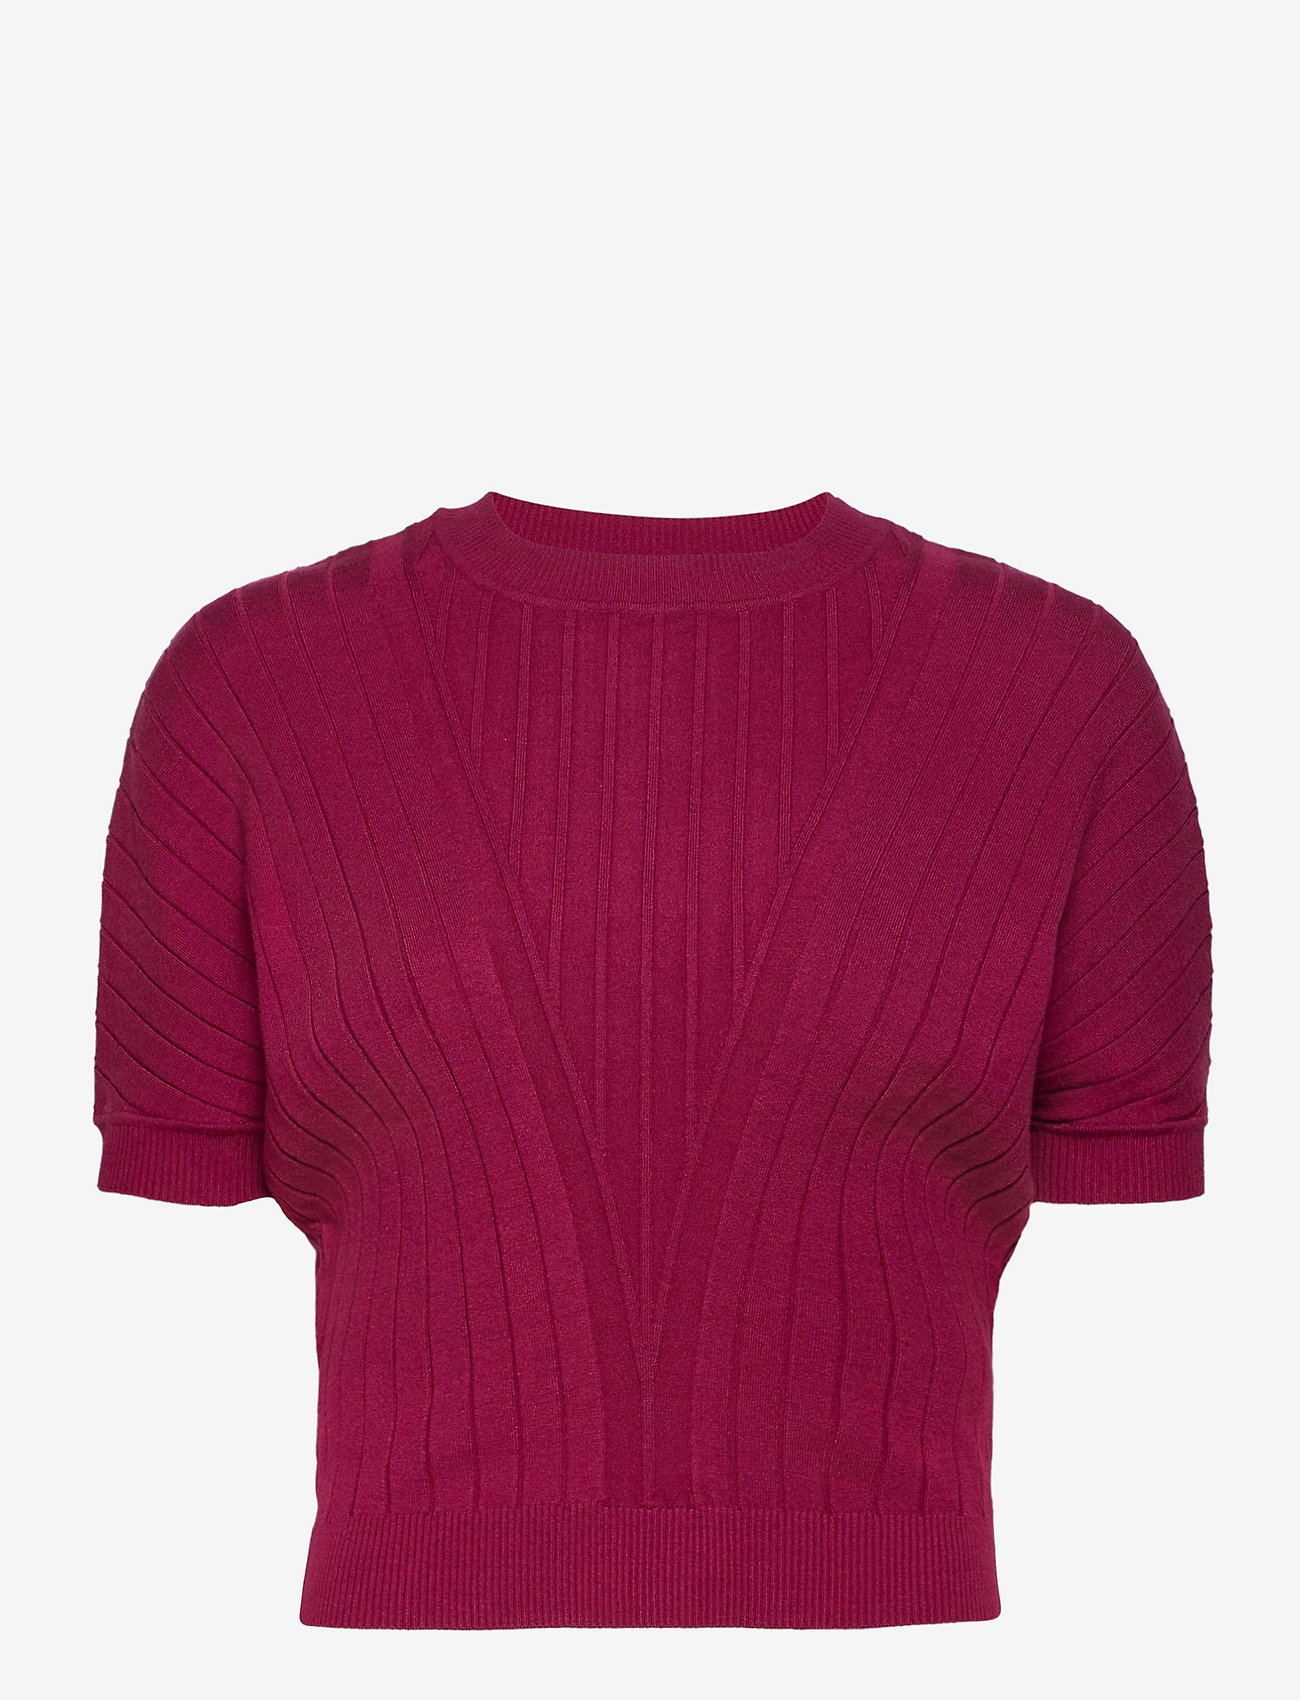 Max&Co. - DAFNE - gebreide t-shirts - burgundy - 0